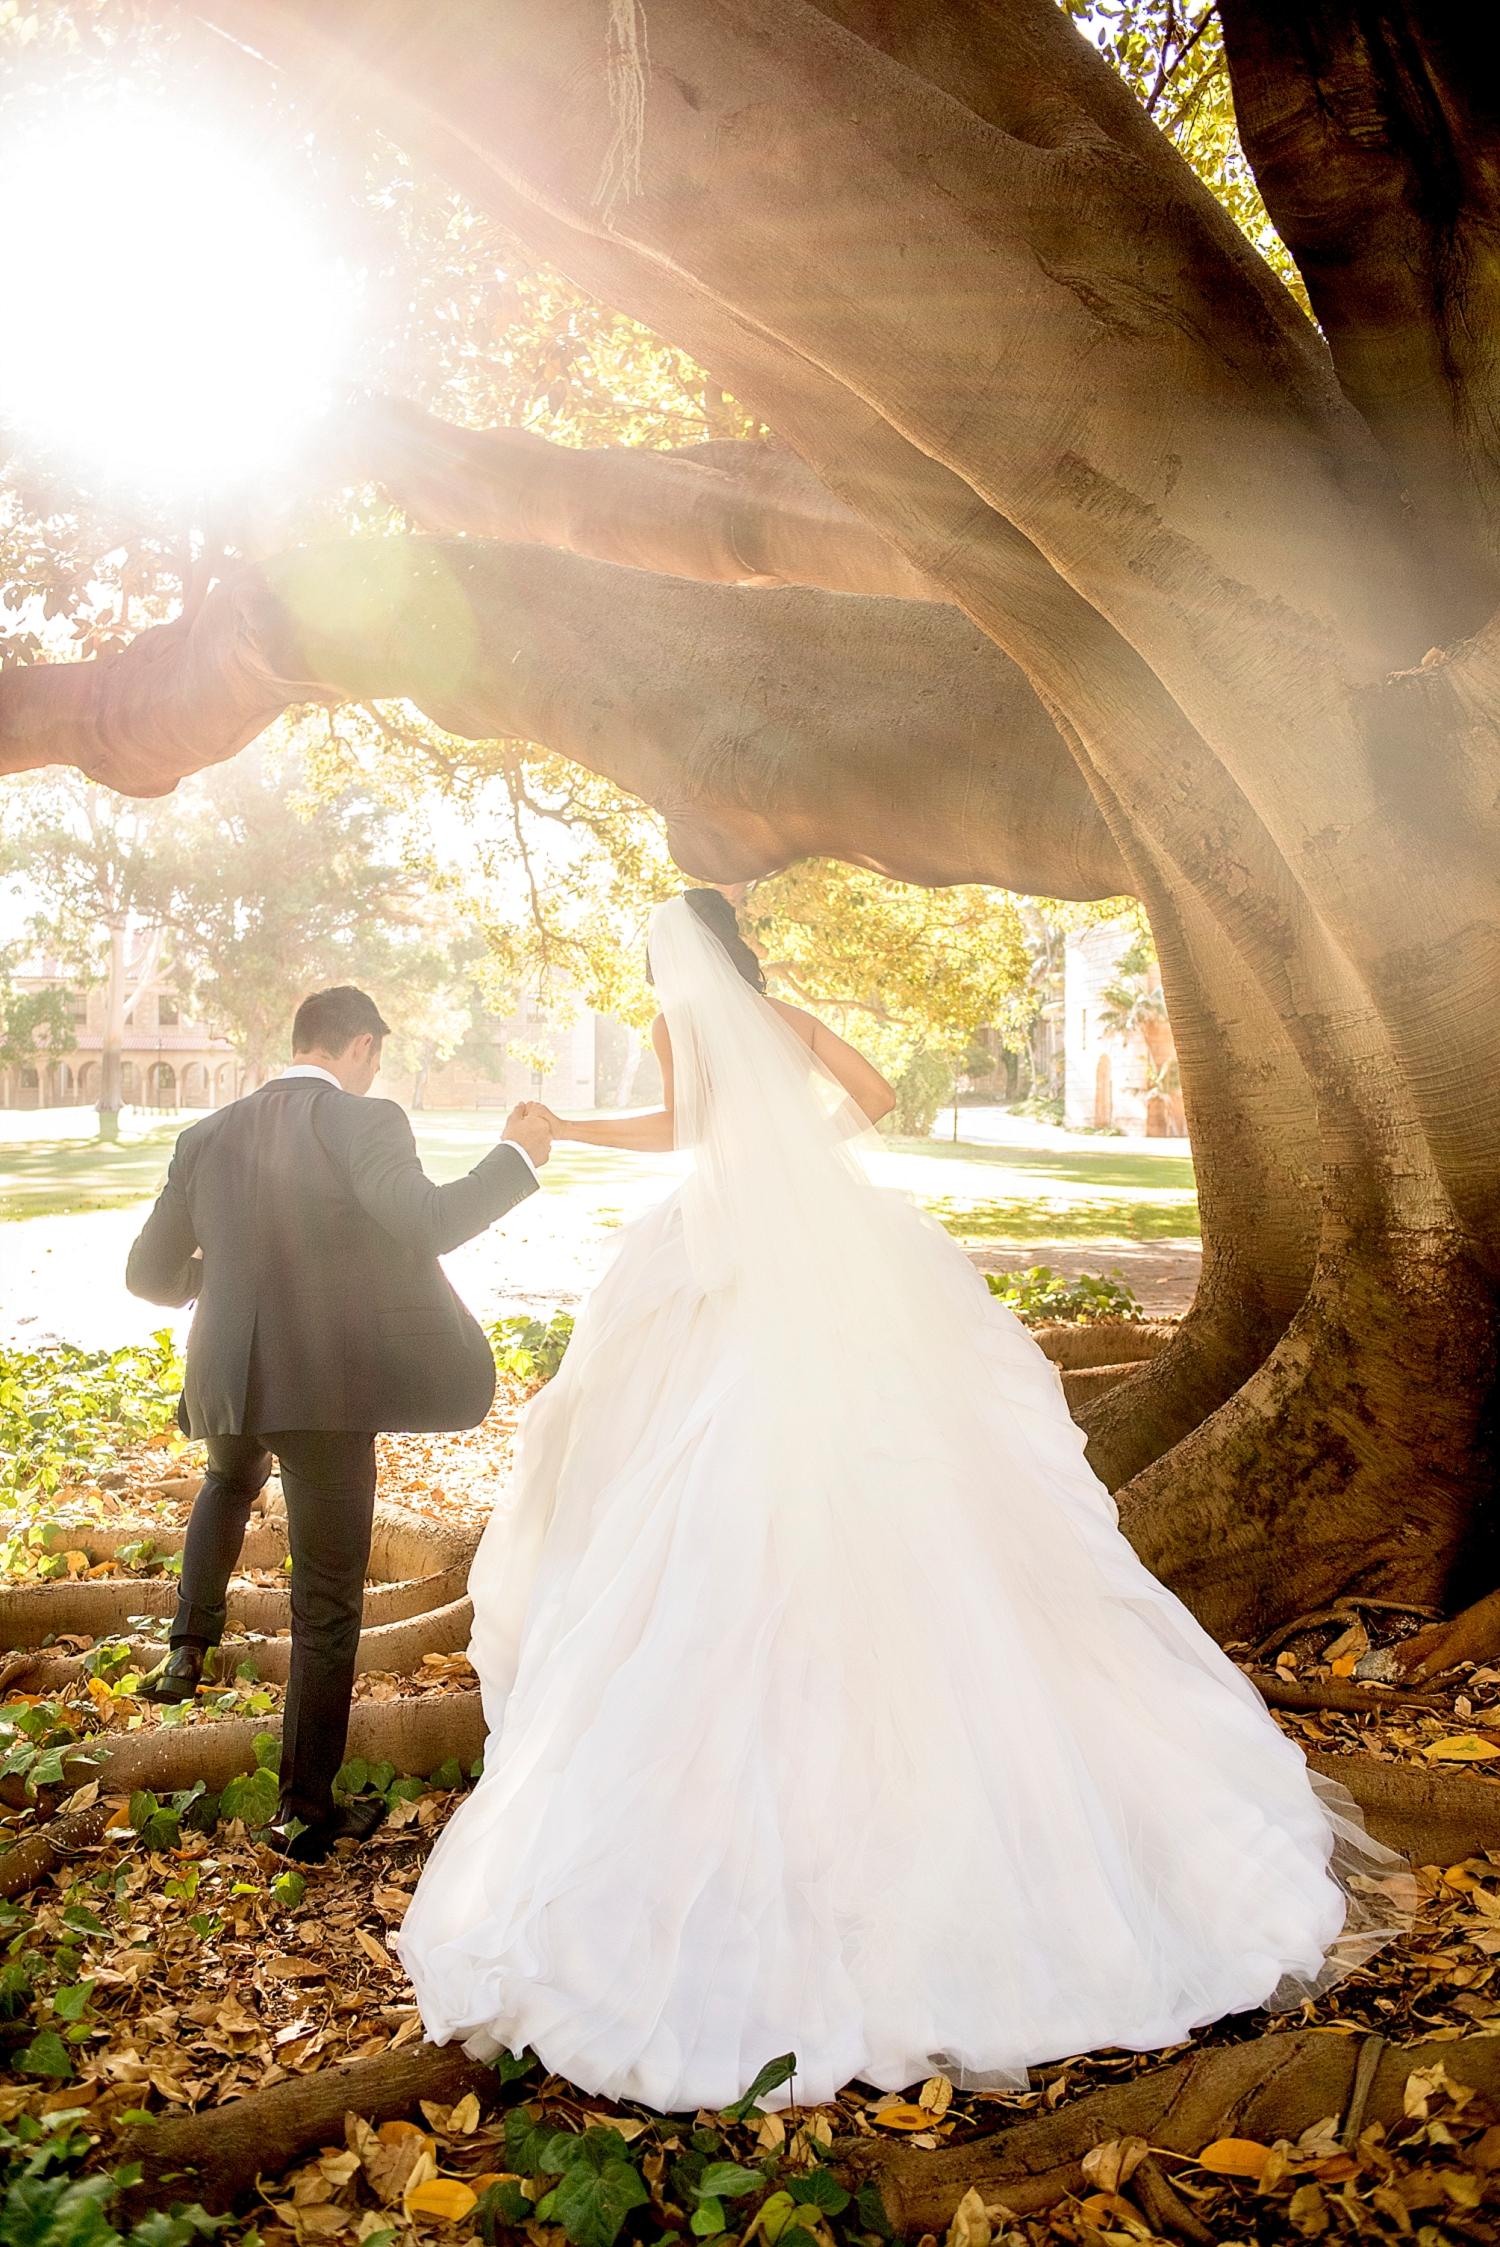 54_wedding photos uwa perth.jpg